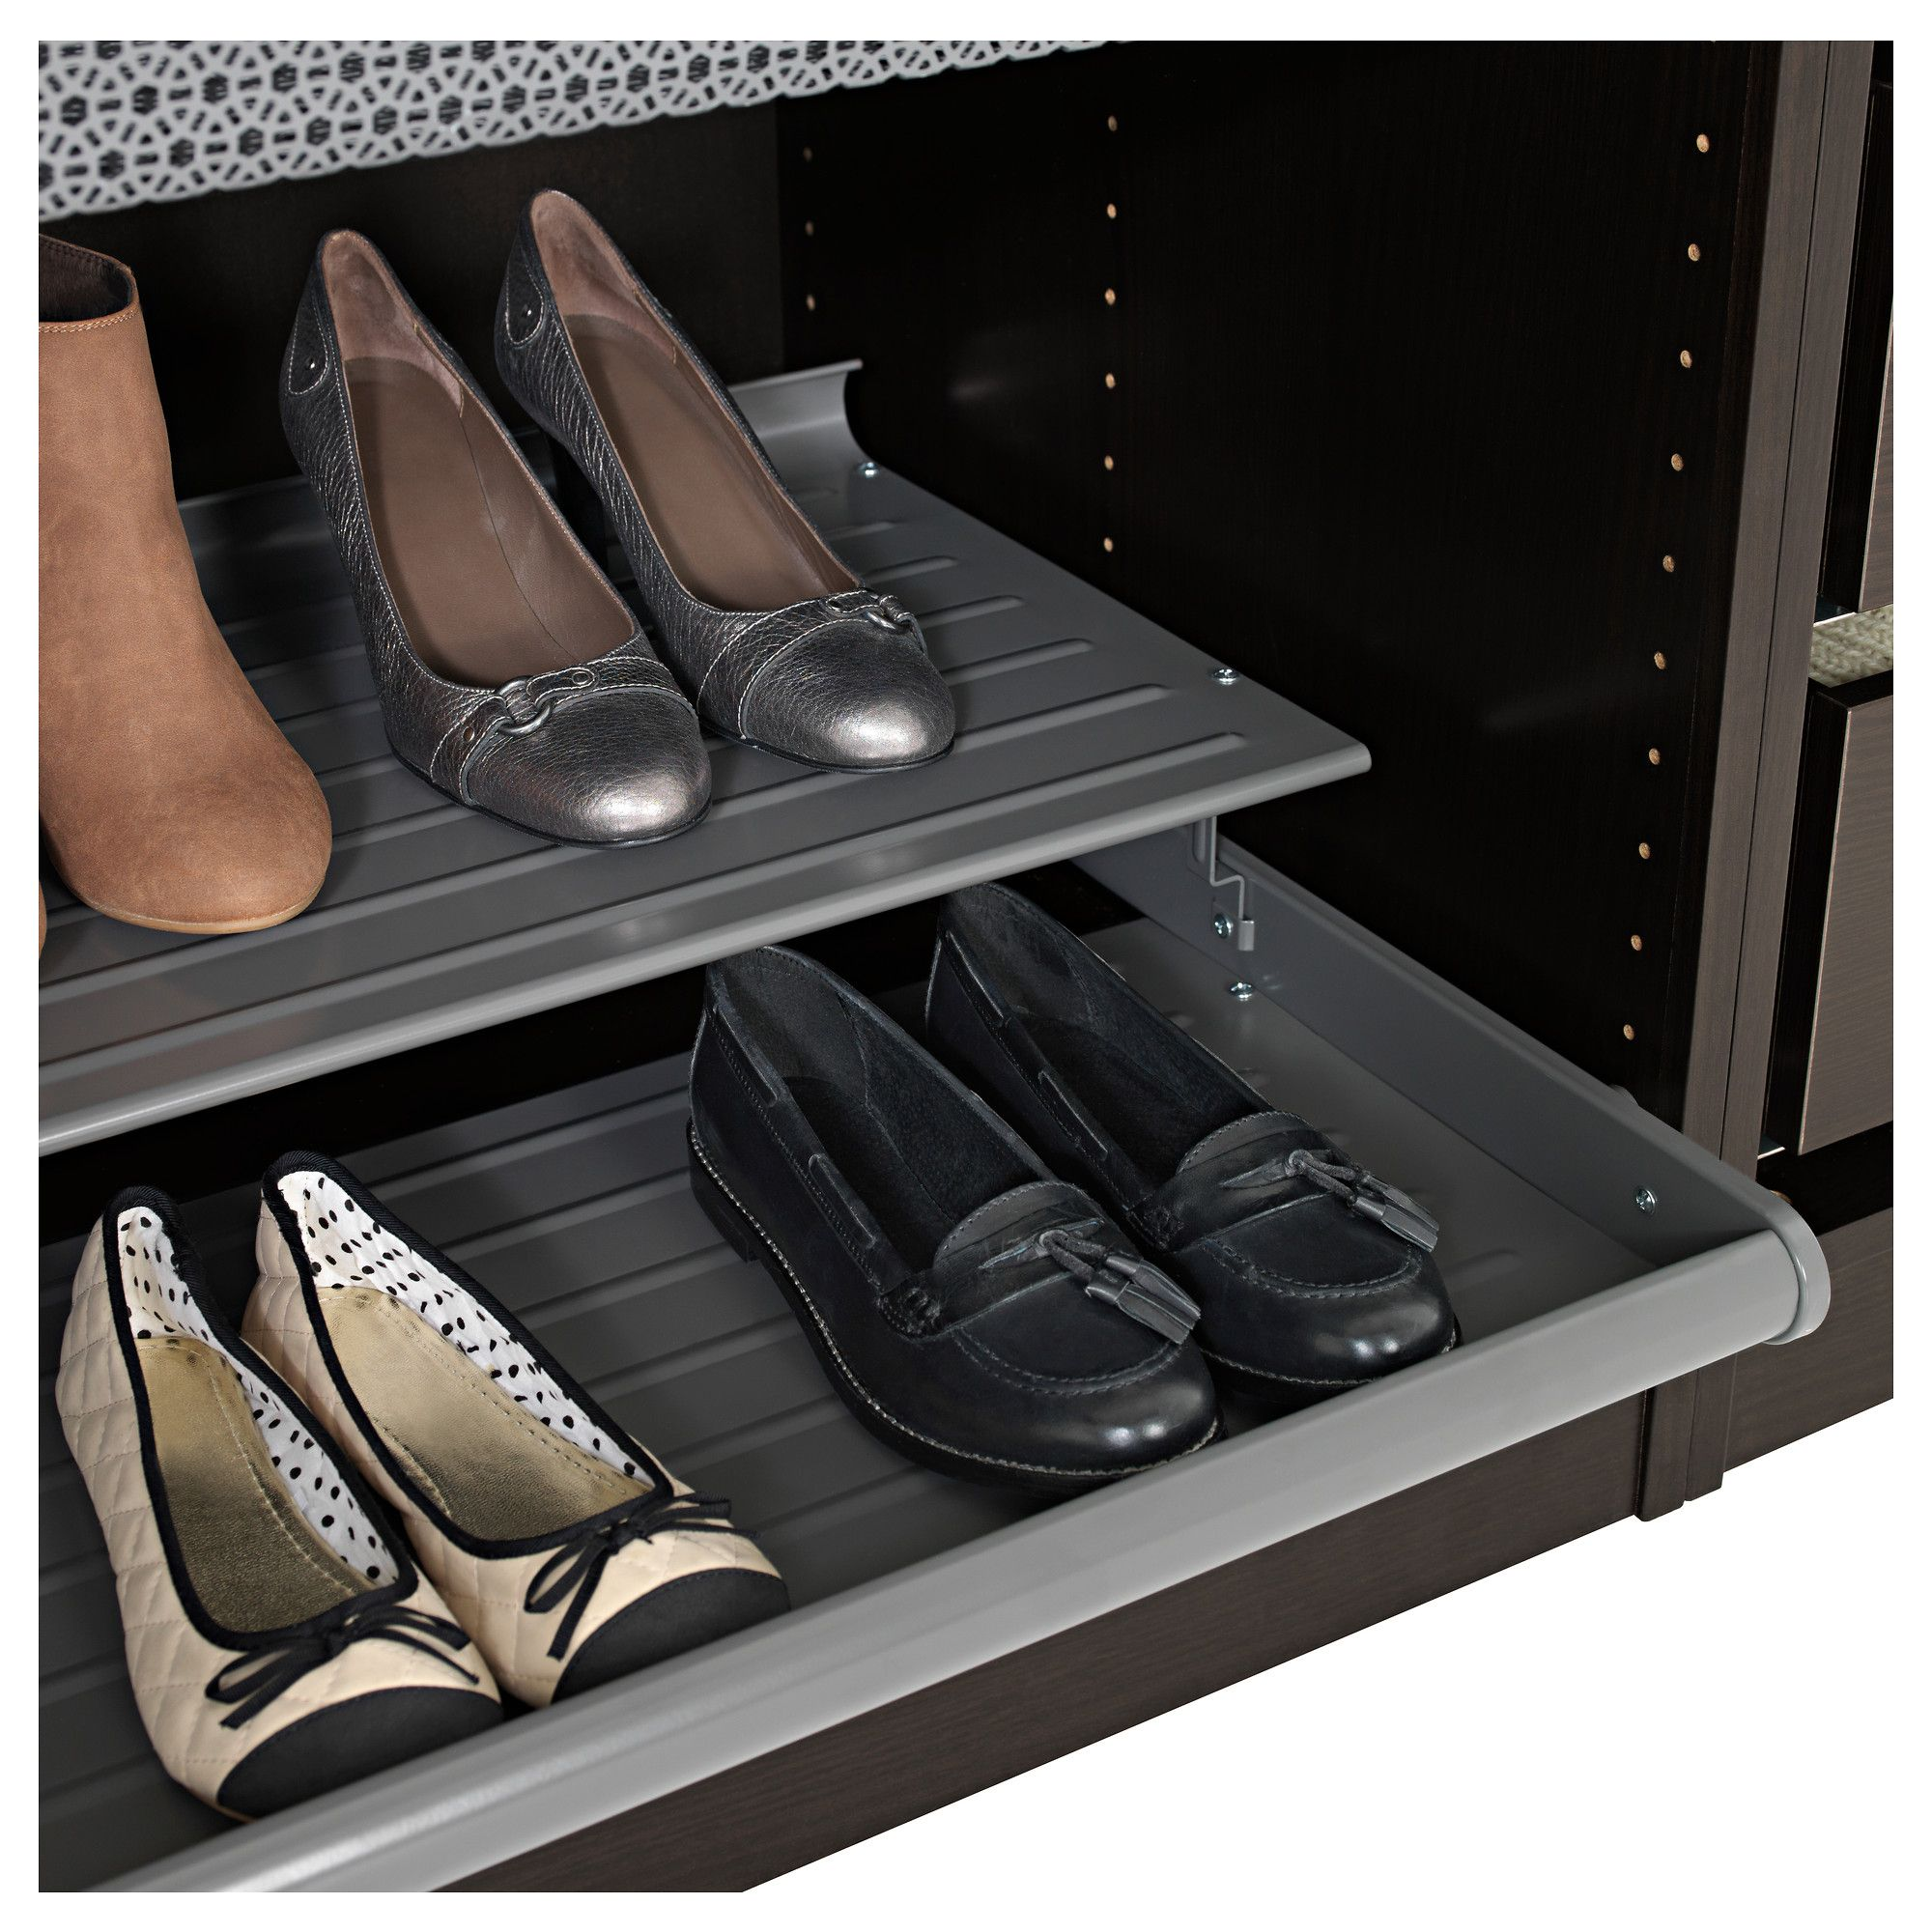 Ikea Komplement Pull Out Shoe Shelf Dark Gray